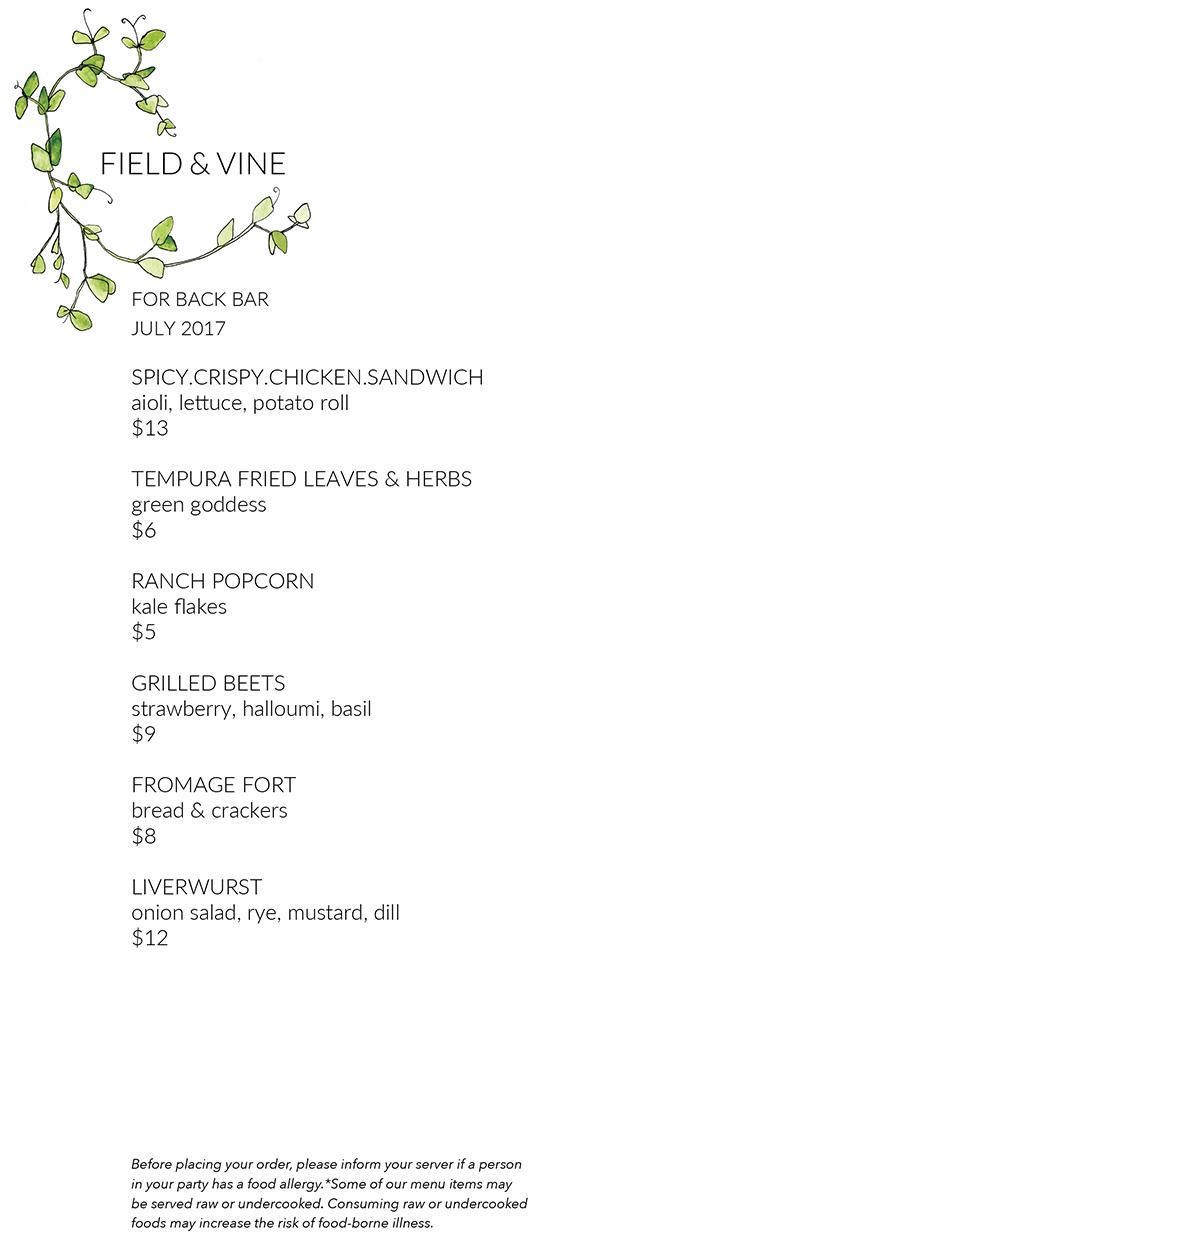 Field & Vine Backbar menu July 2017